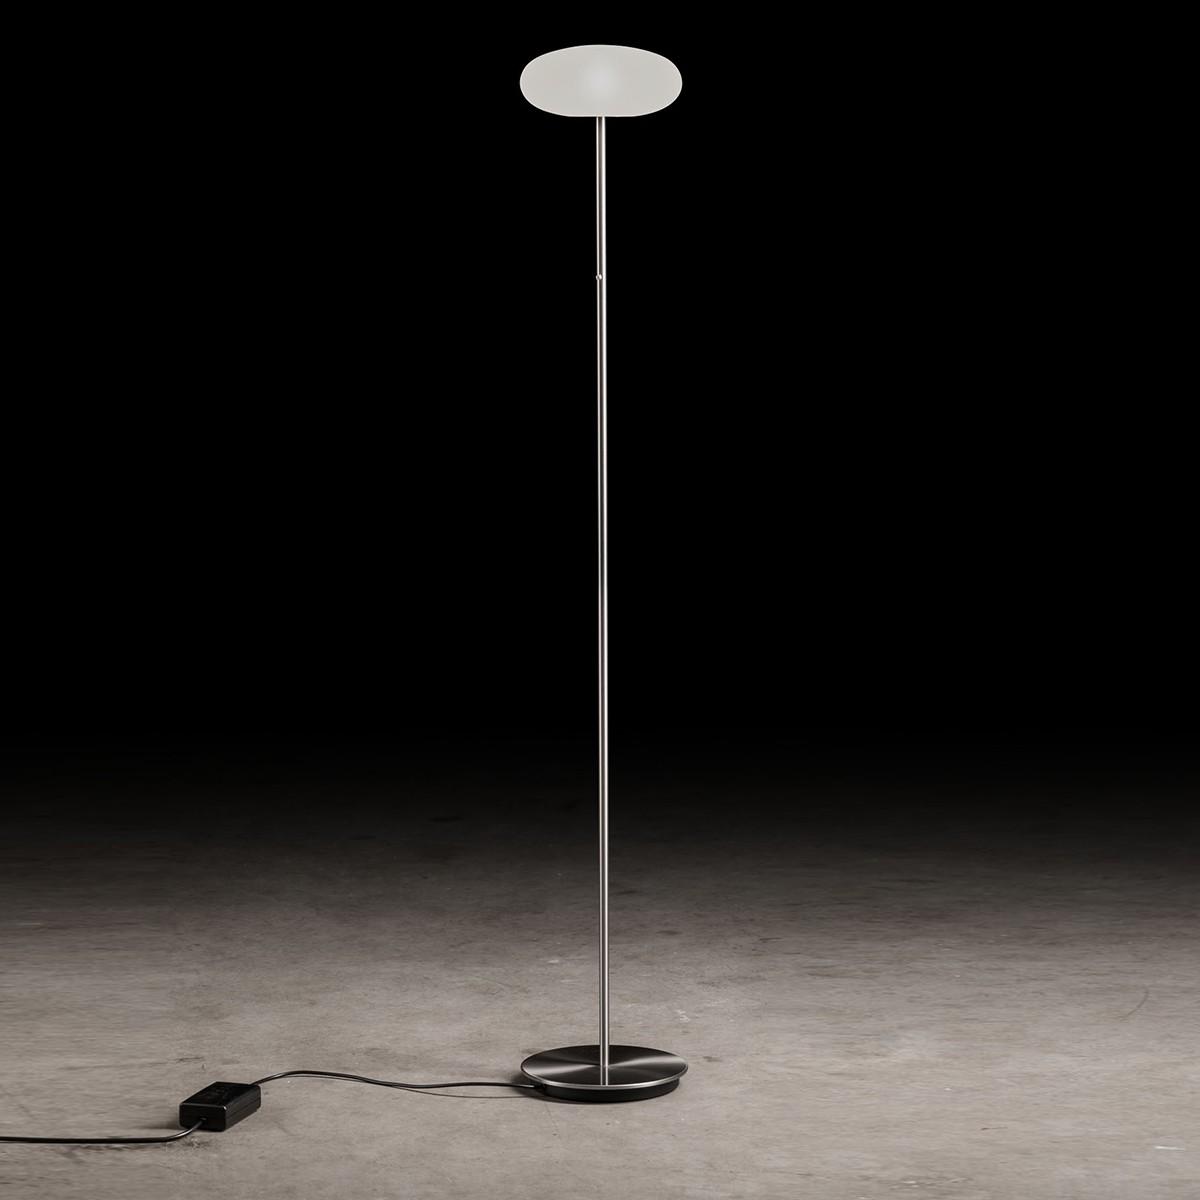 Holtkötter Leuchten Amor S Stehleuchte LED, Höhe: 180 cm / Nickel matt